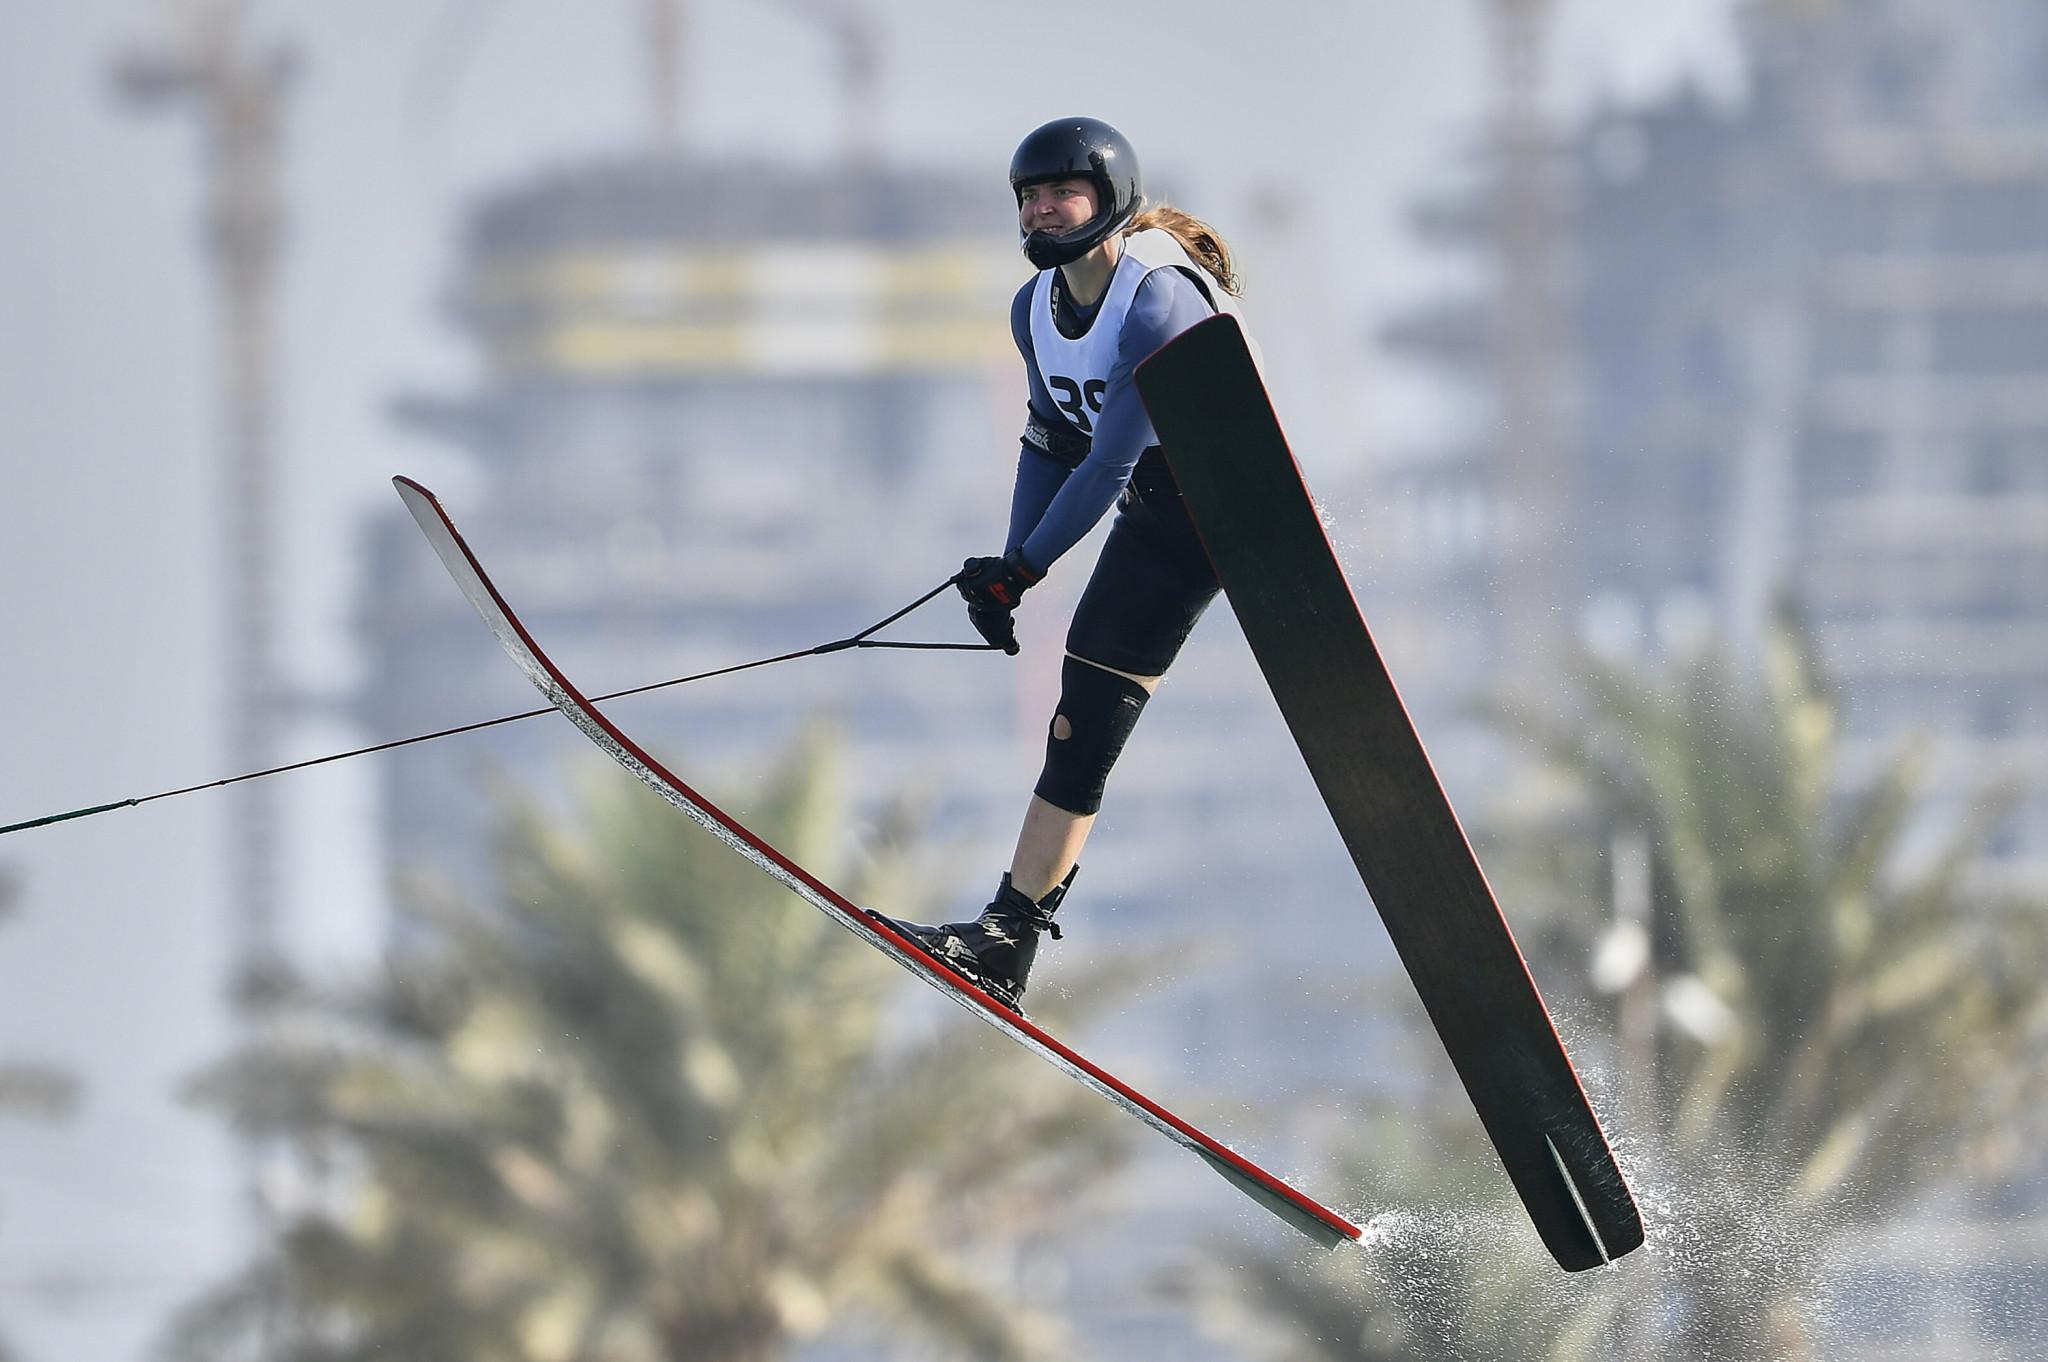 Waterski jump qualification begun ©ANOC